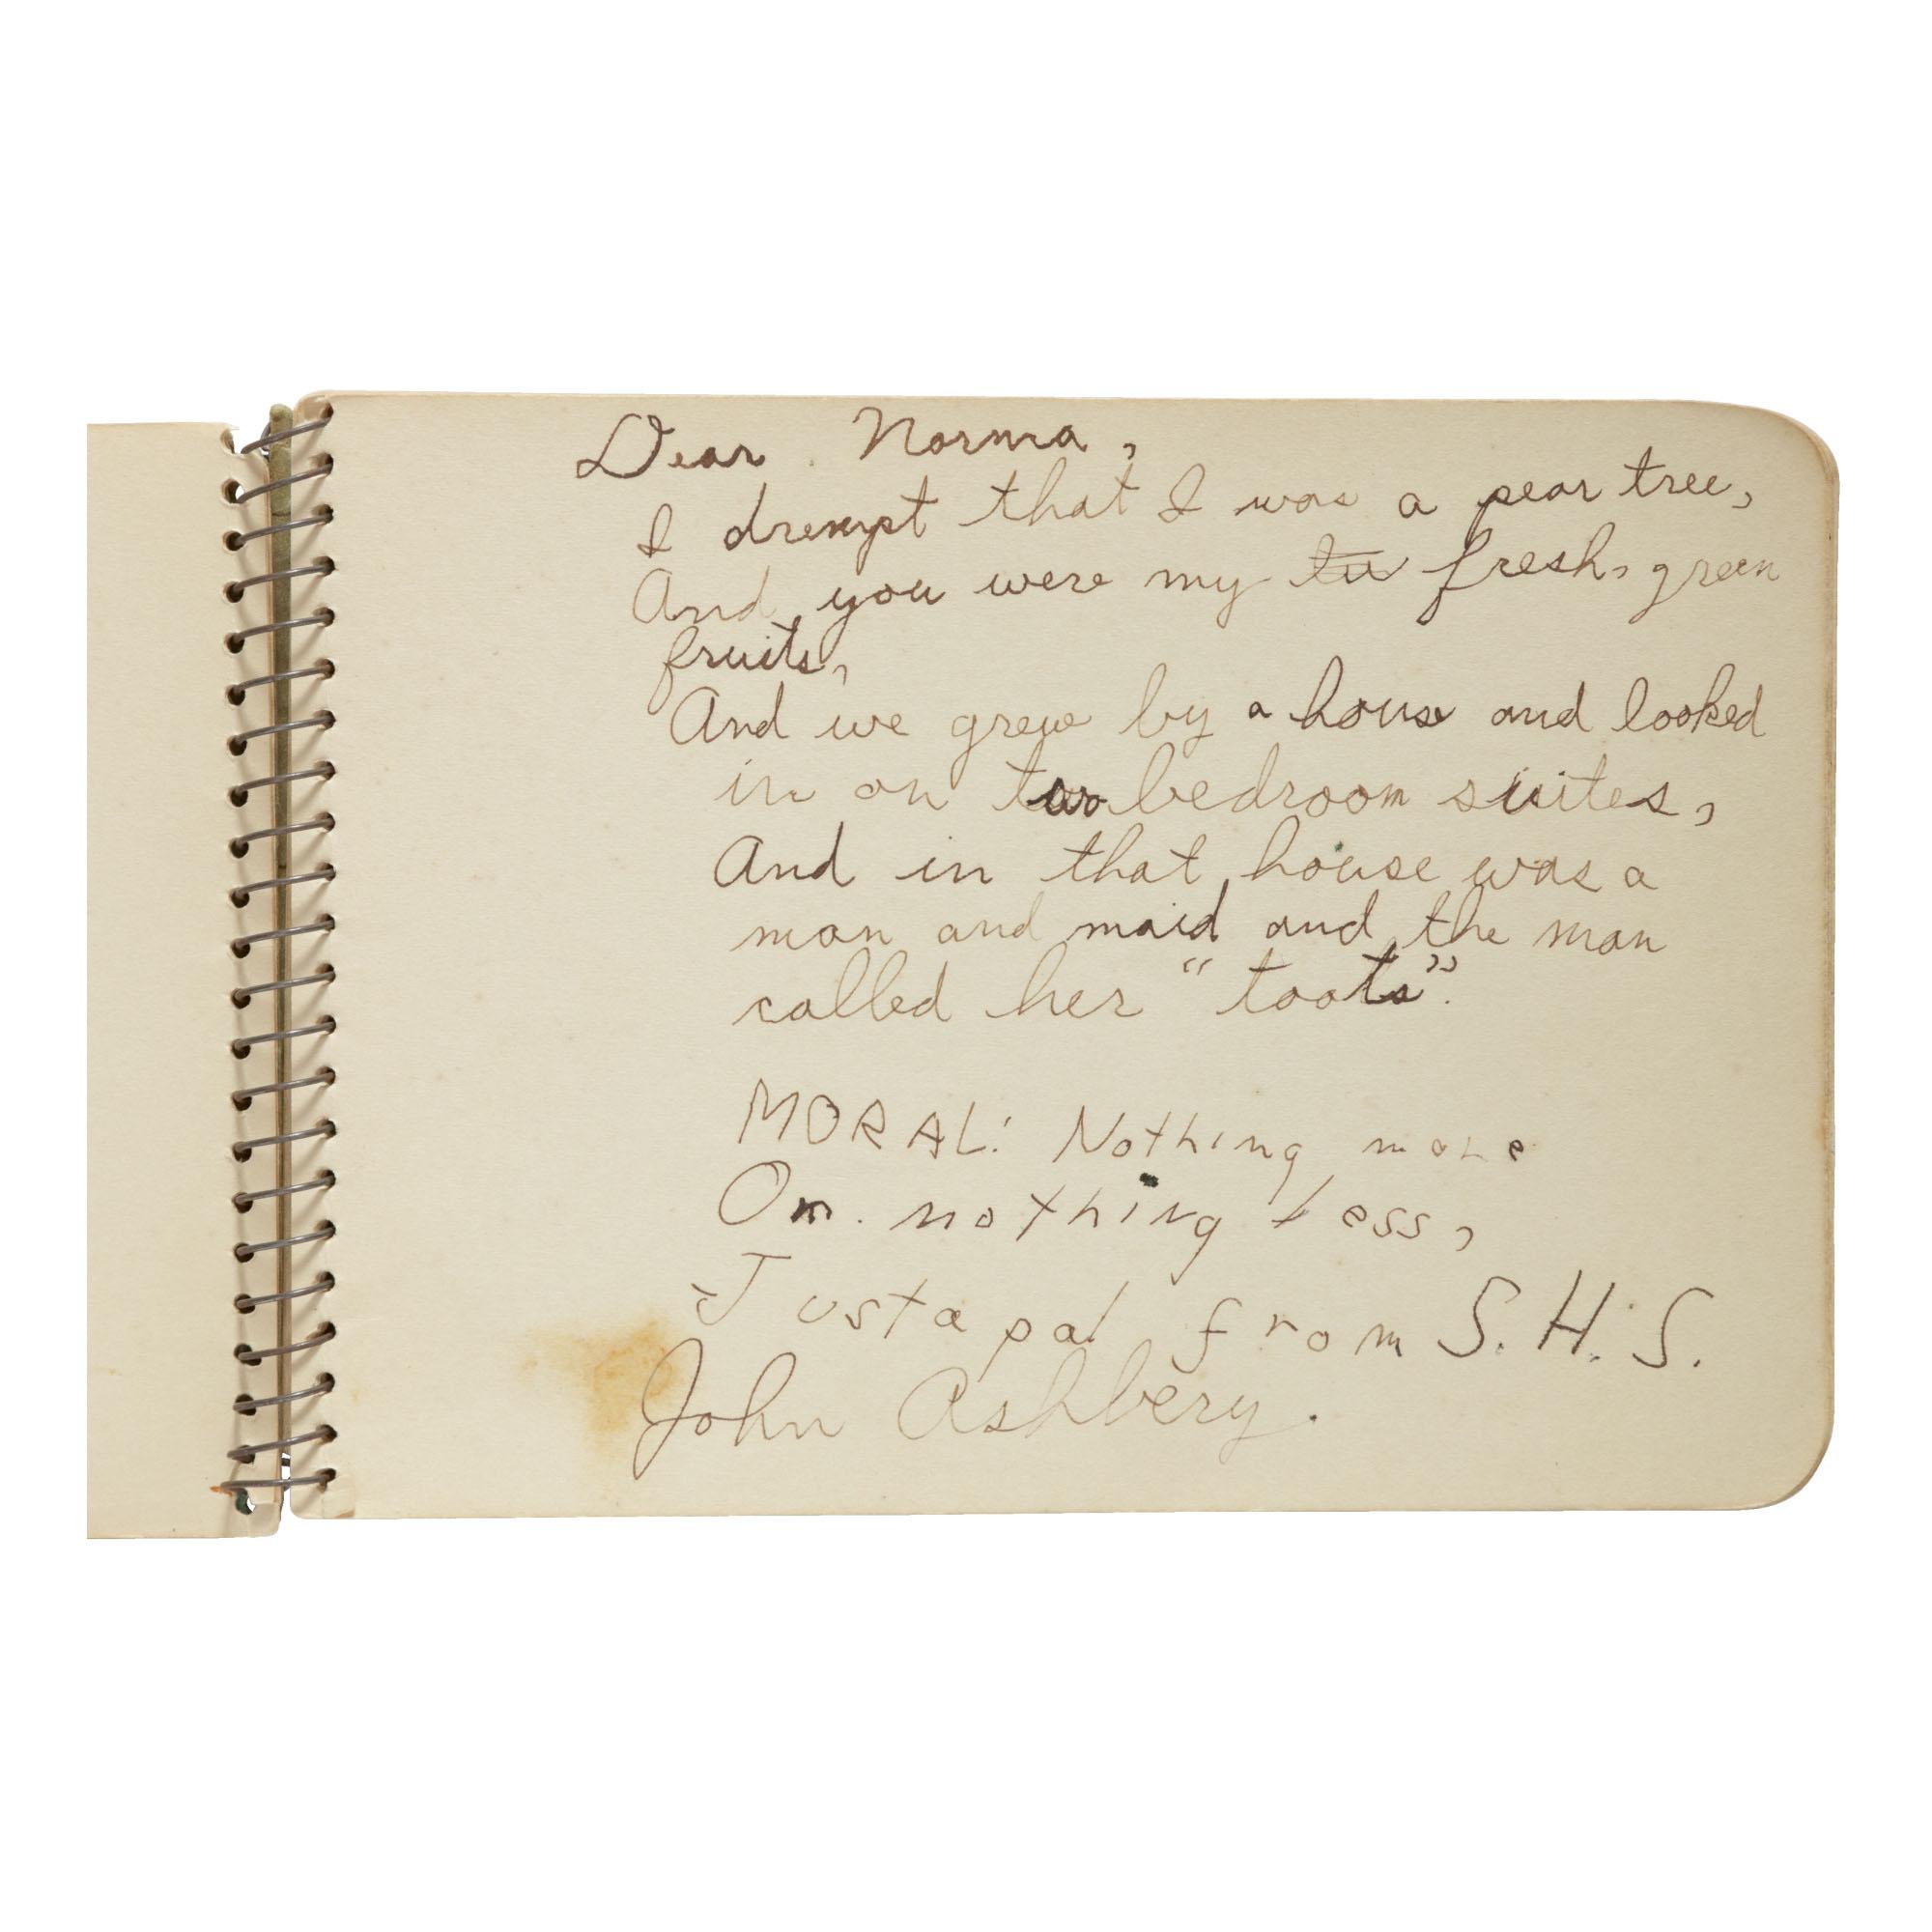 JOHN ASHBERY | MANUSCRIPT JUVENILIA IN AN AUTOGRAPH ALBUM. [SODUS, NEW YORK], 1936–1937